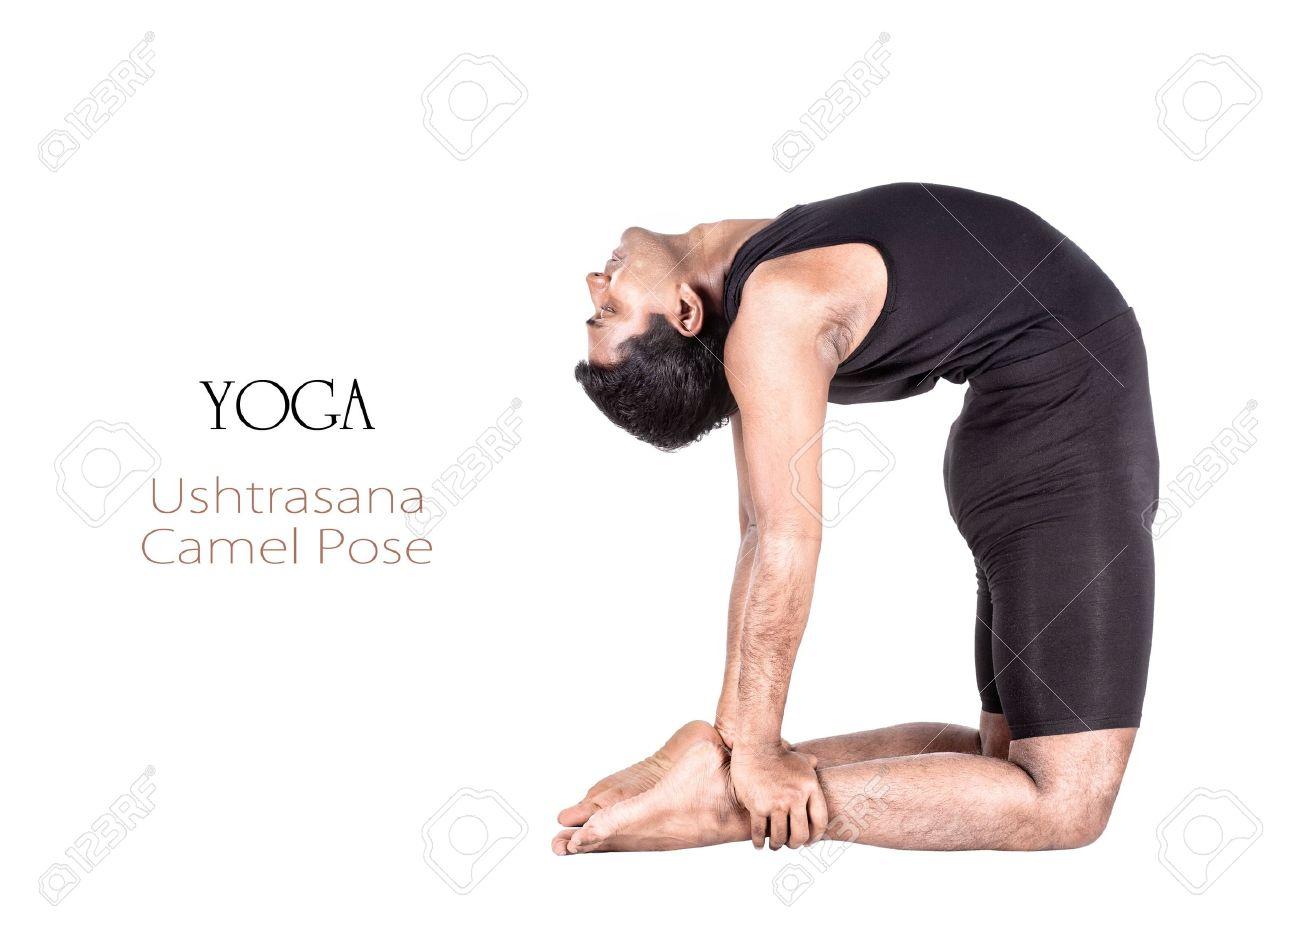 Yoga Ushtrasana Camello Plantean Por El Hombre Indio En Paño Negro ...